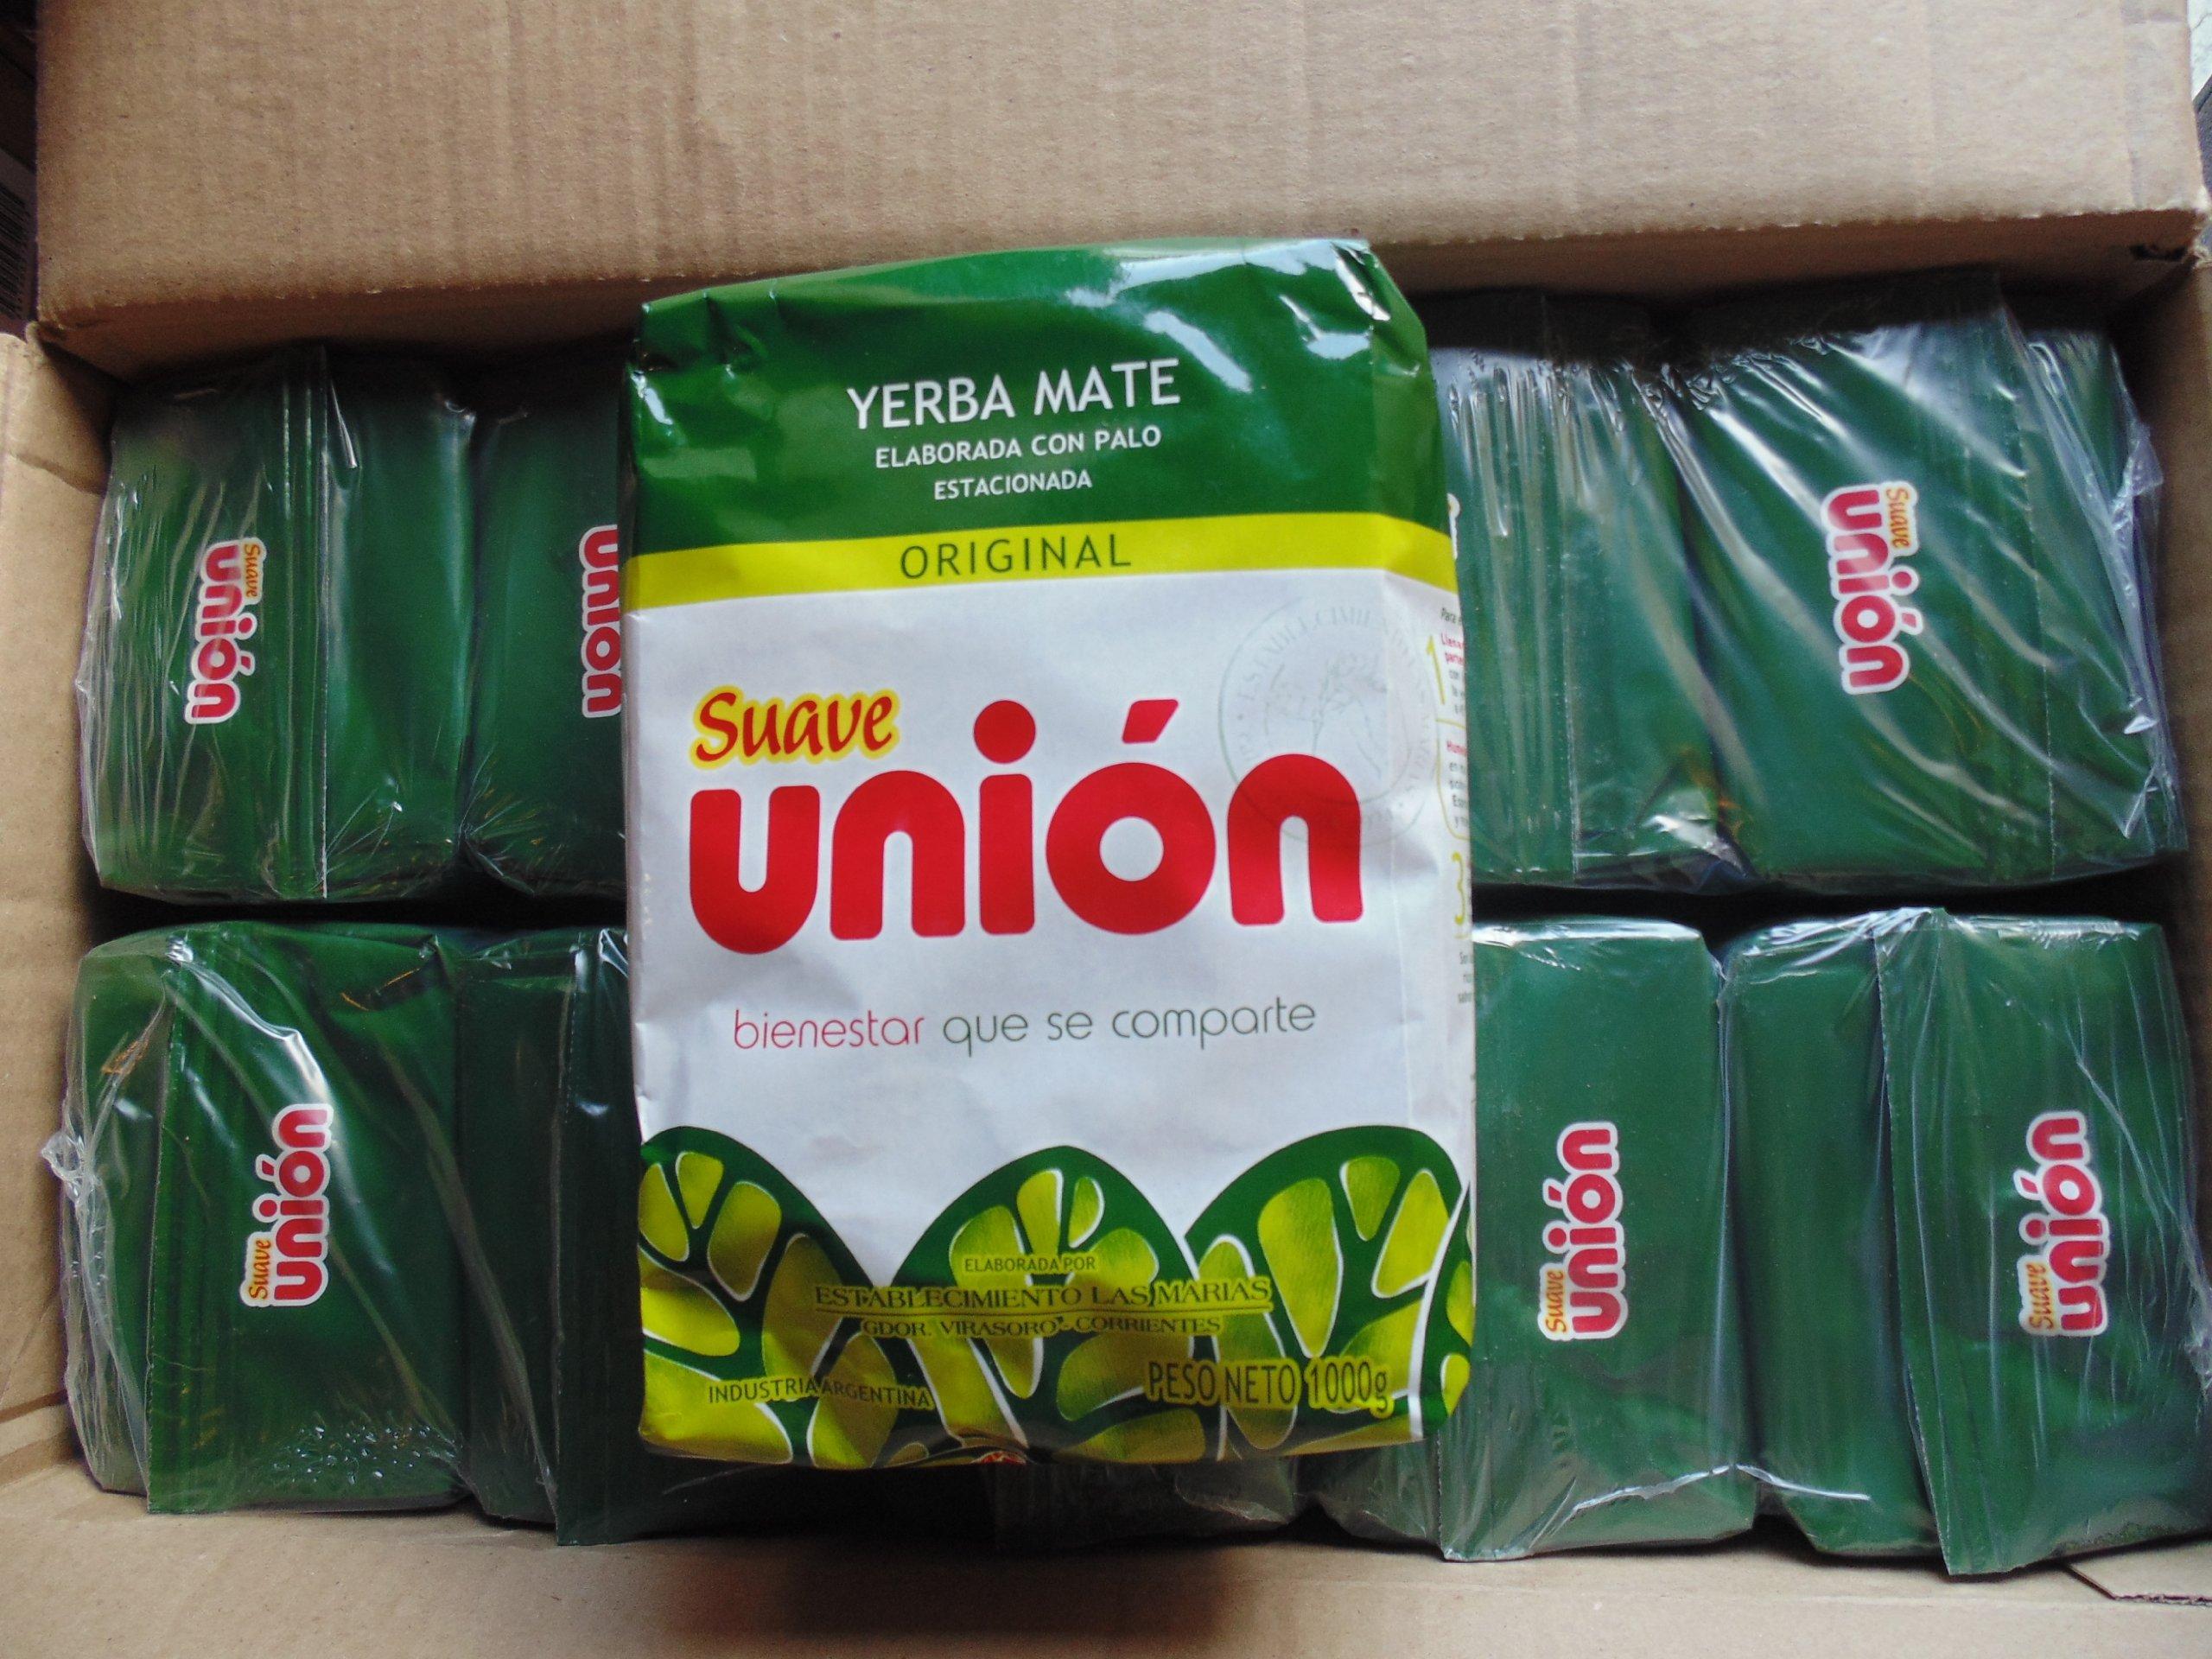 Union Yerba Mate Suave 2.2 Lbs/ 1 Kilo (10 Packs)